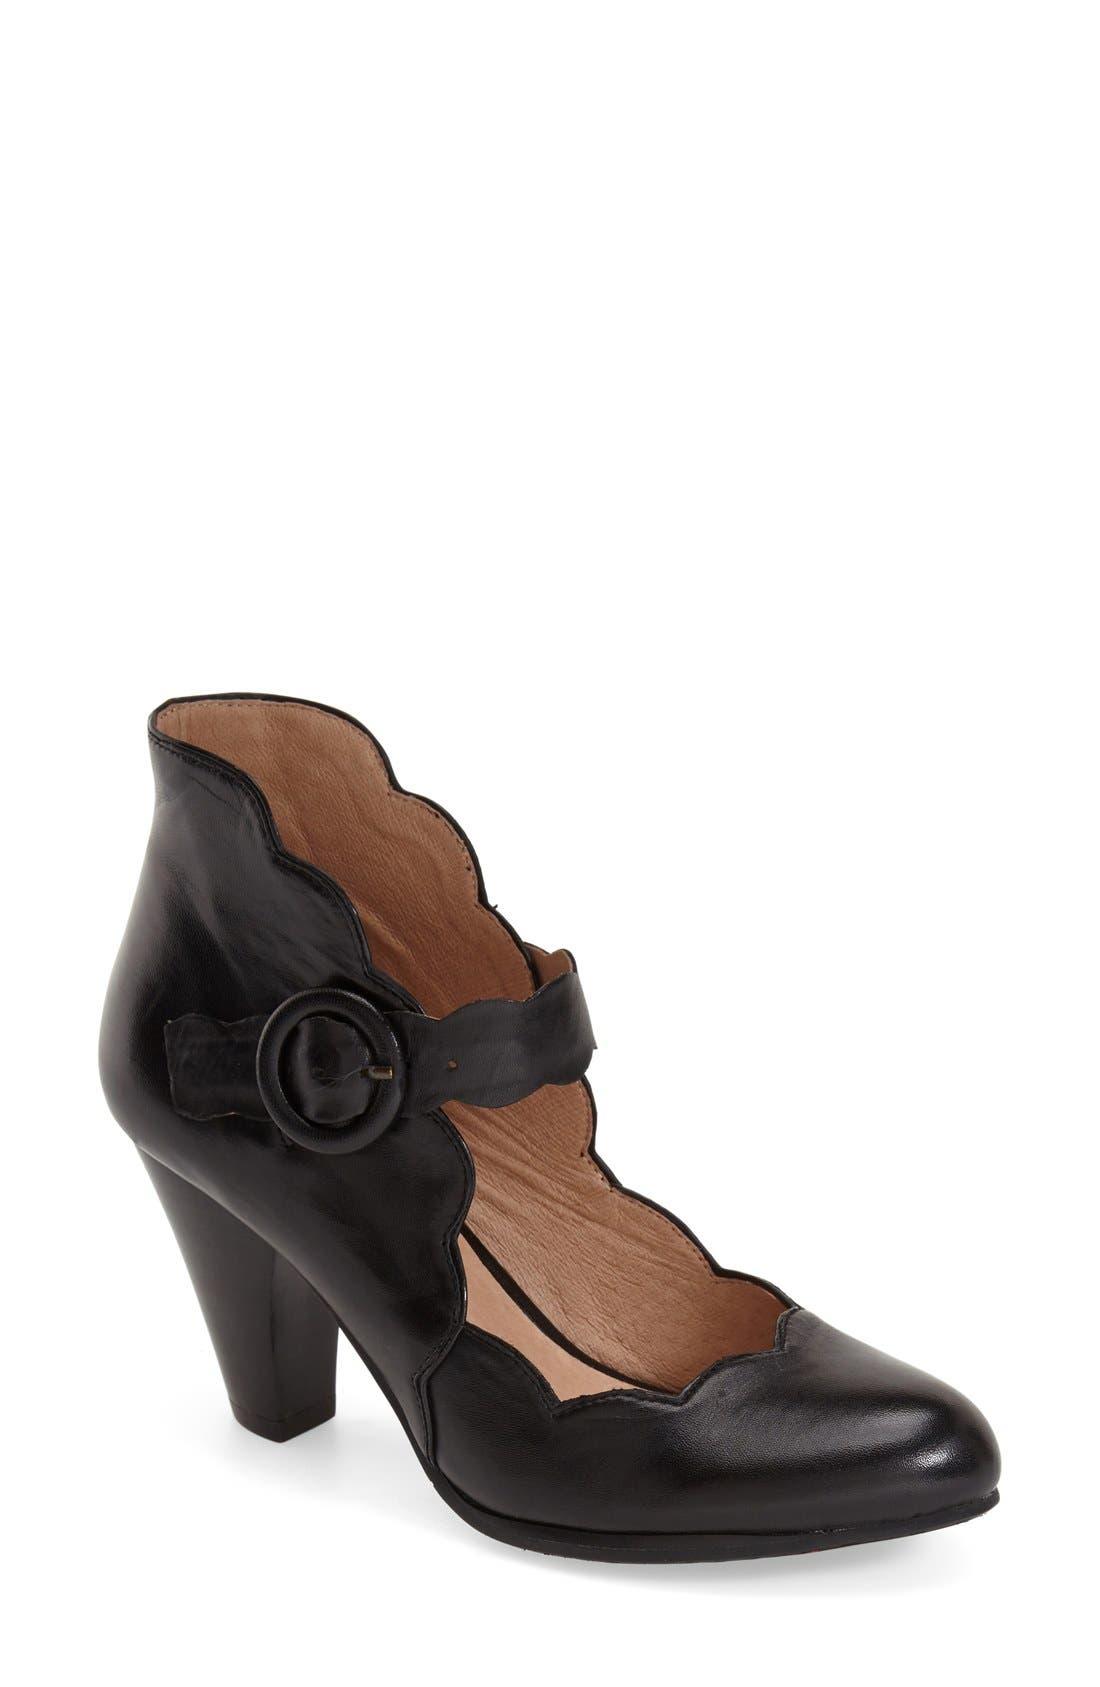 Alternate Image 1 Selected - Miz Mooz Footwear 'Carissa' Mary Jane Pump (Women)